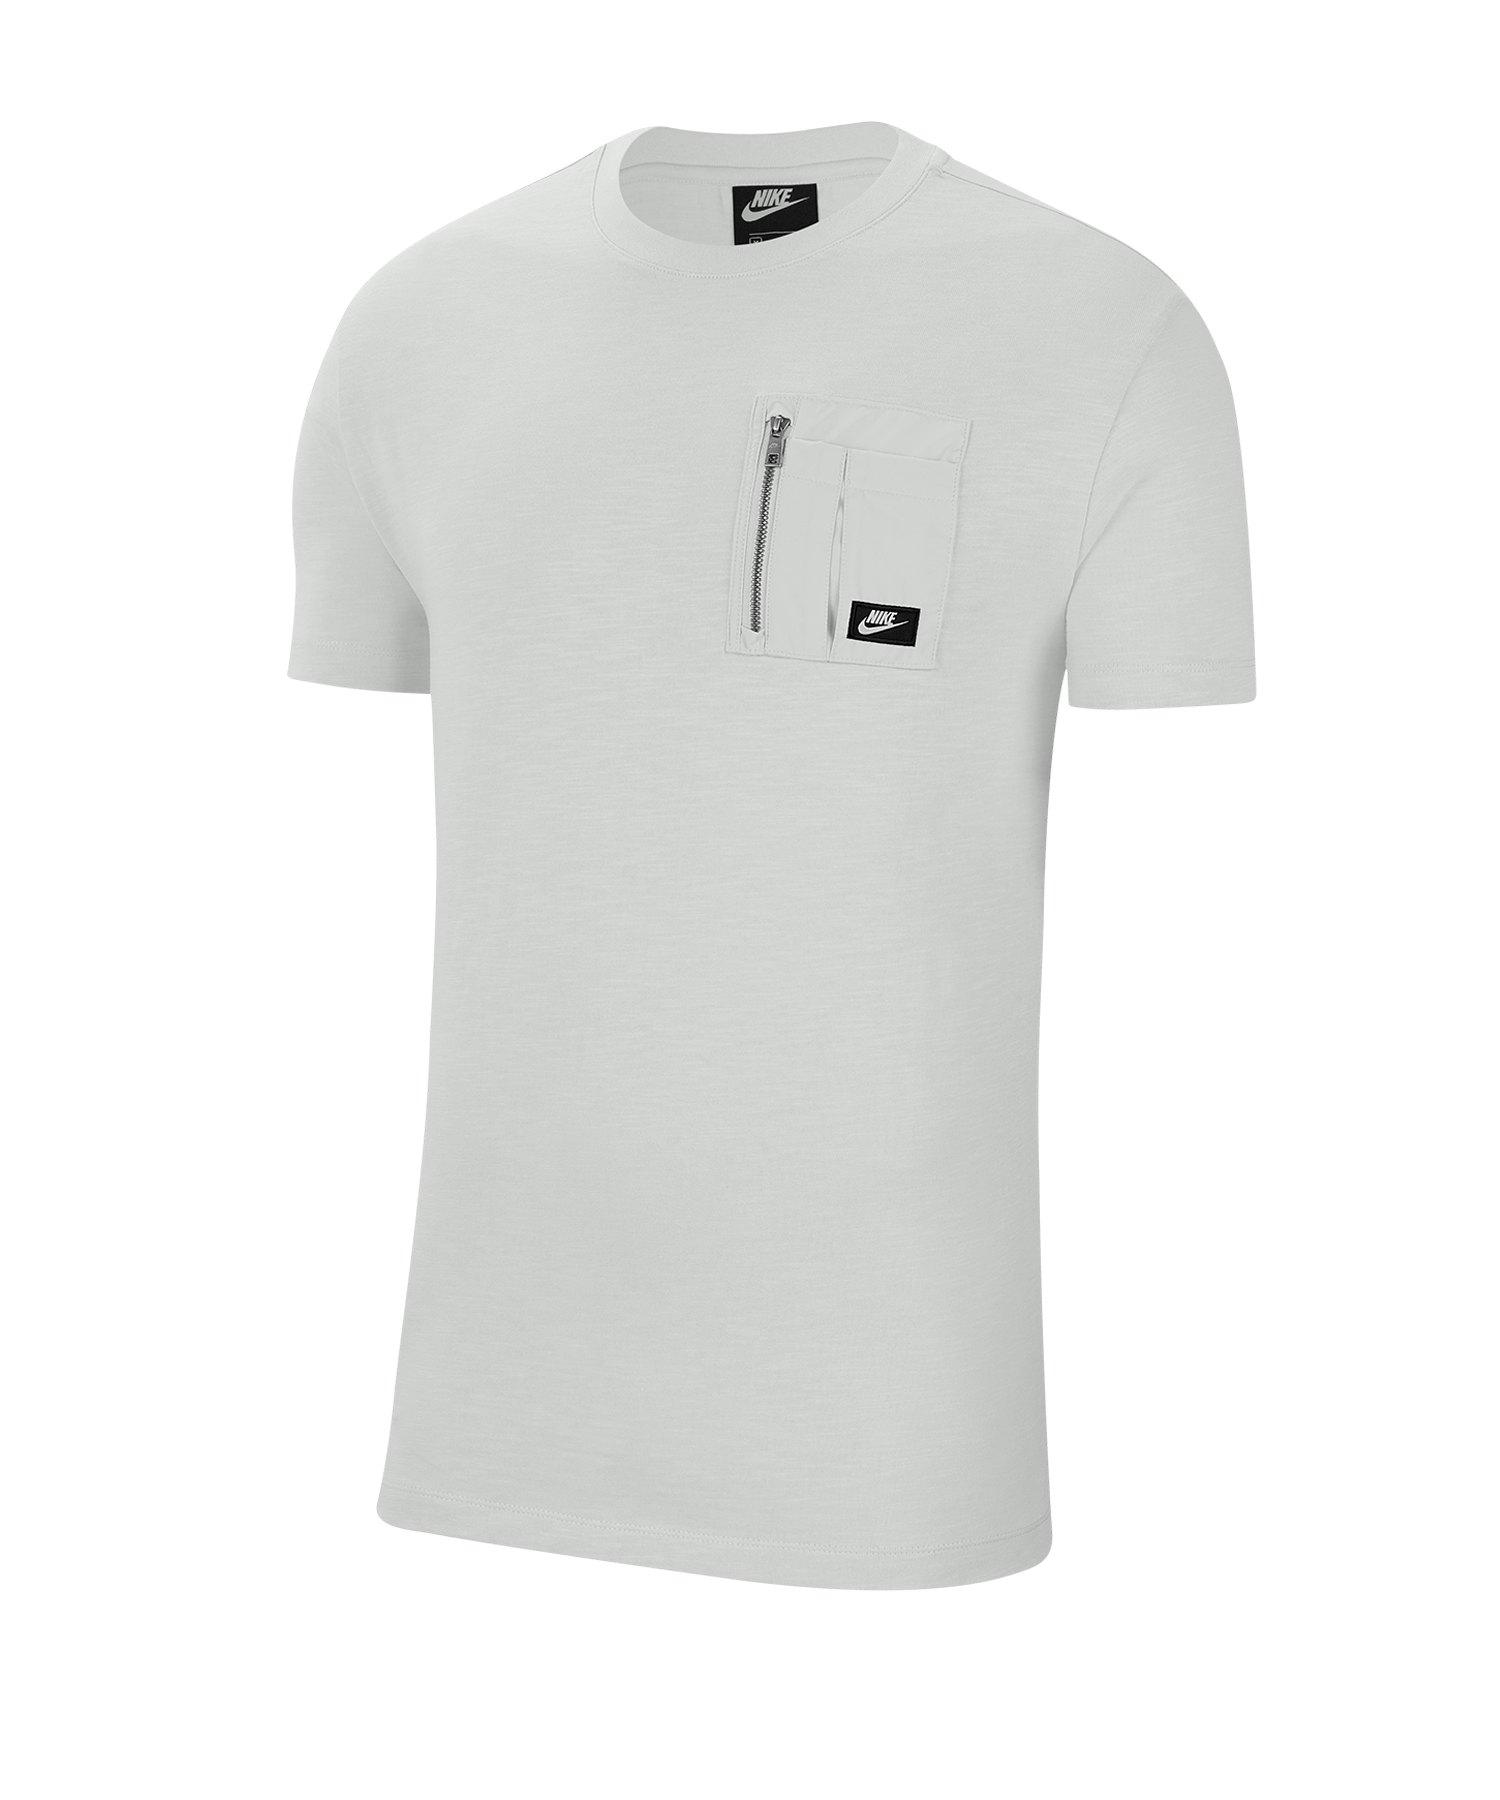 Nike Mix Tee T-Shirt Braun F028 - braun